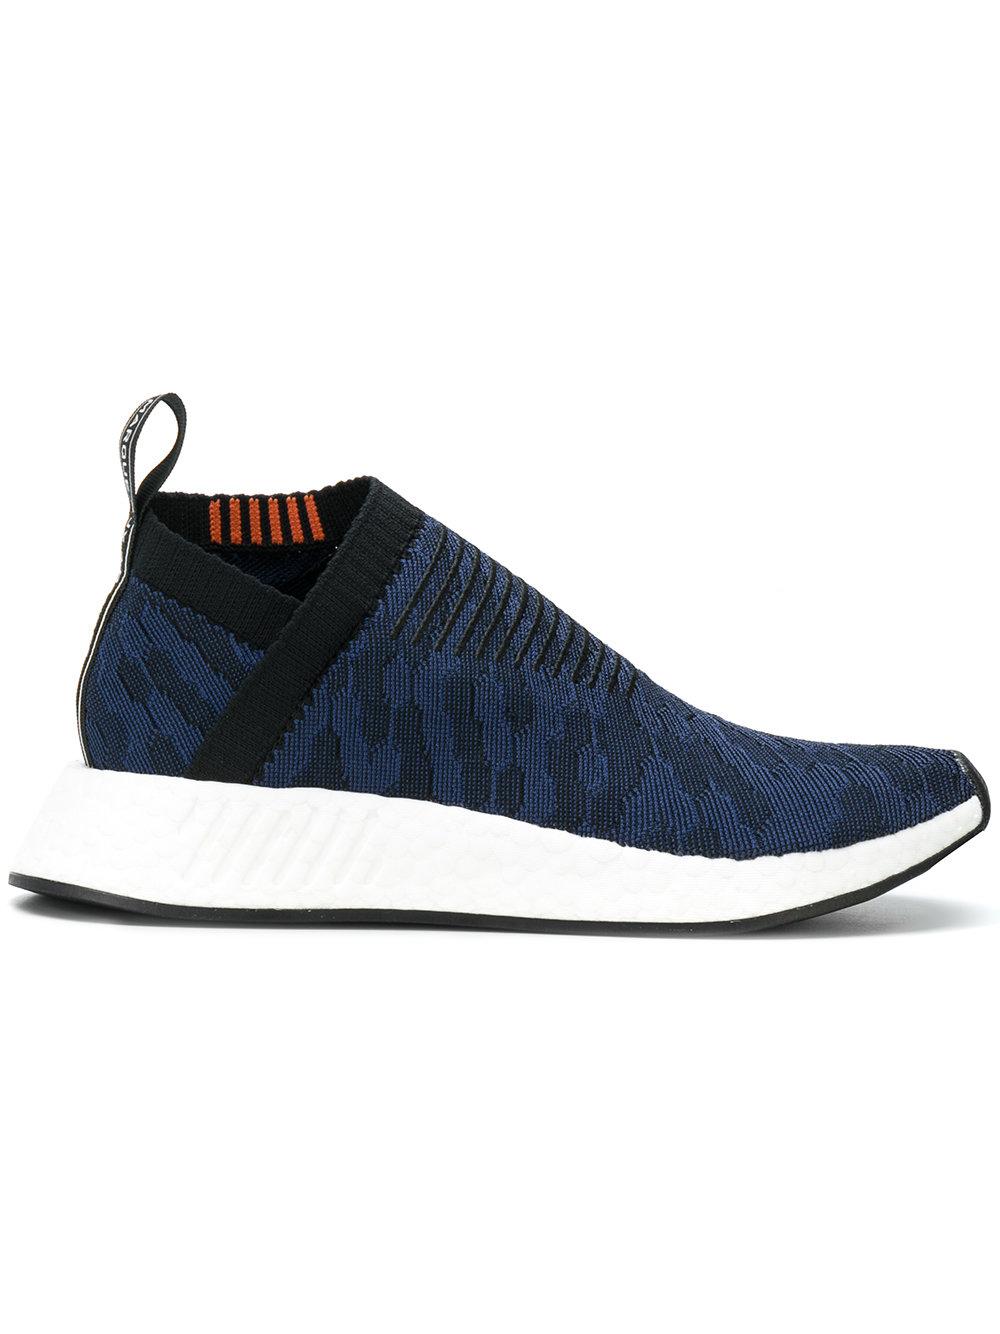 Adidas NMD primeknit sneakers